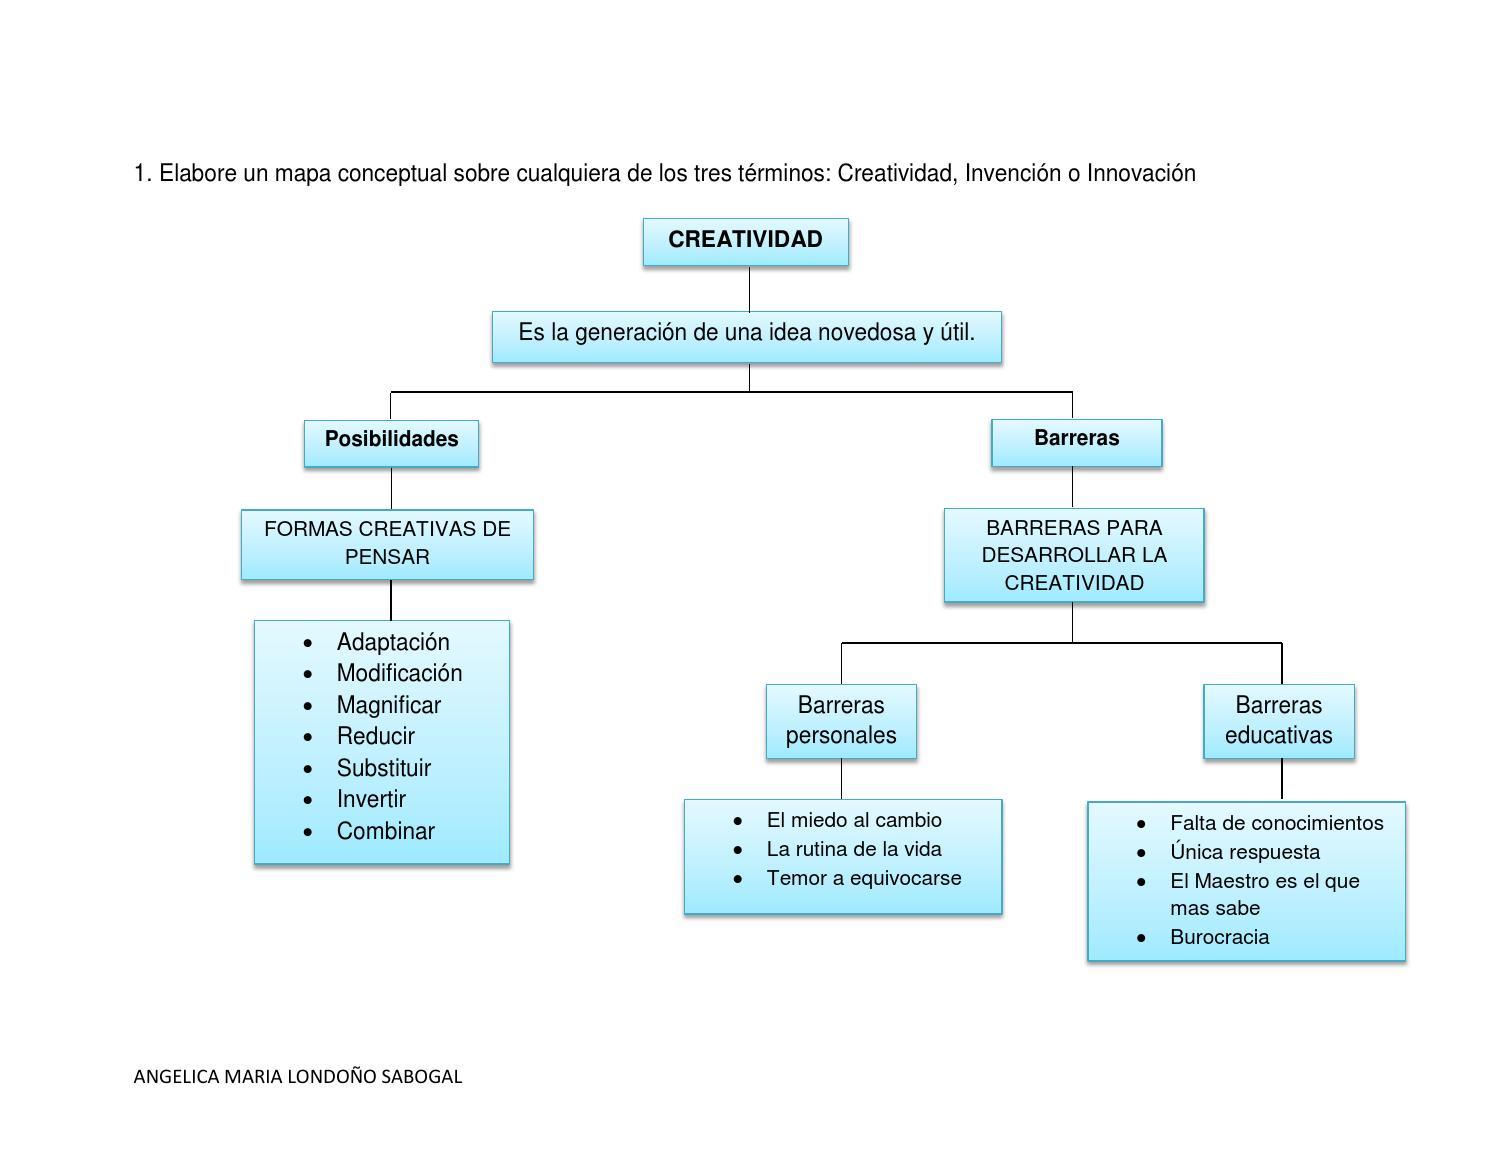 tres charlas a sociedades médicas pdf gratis